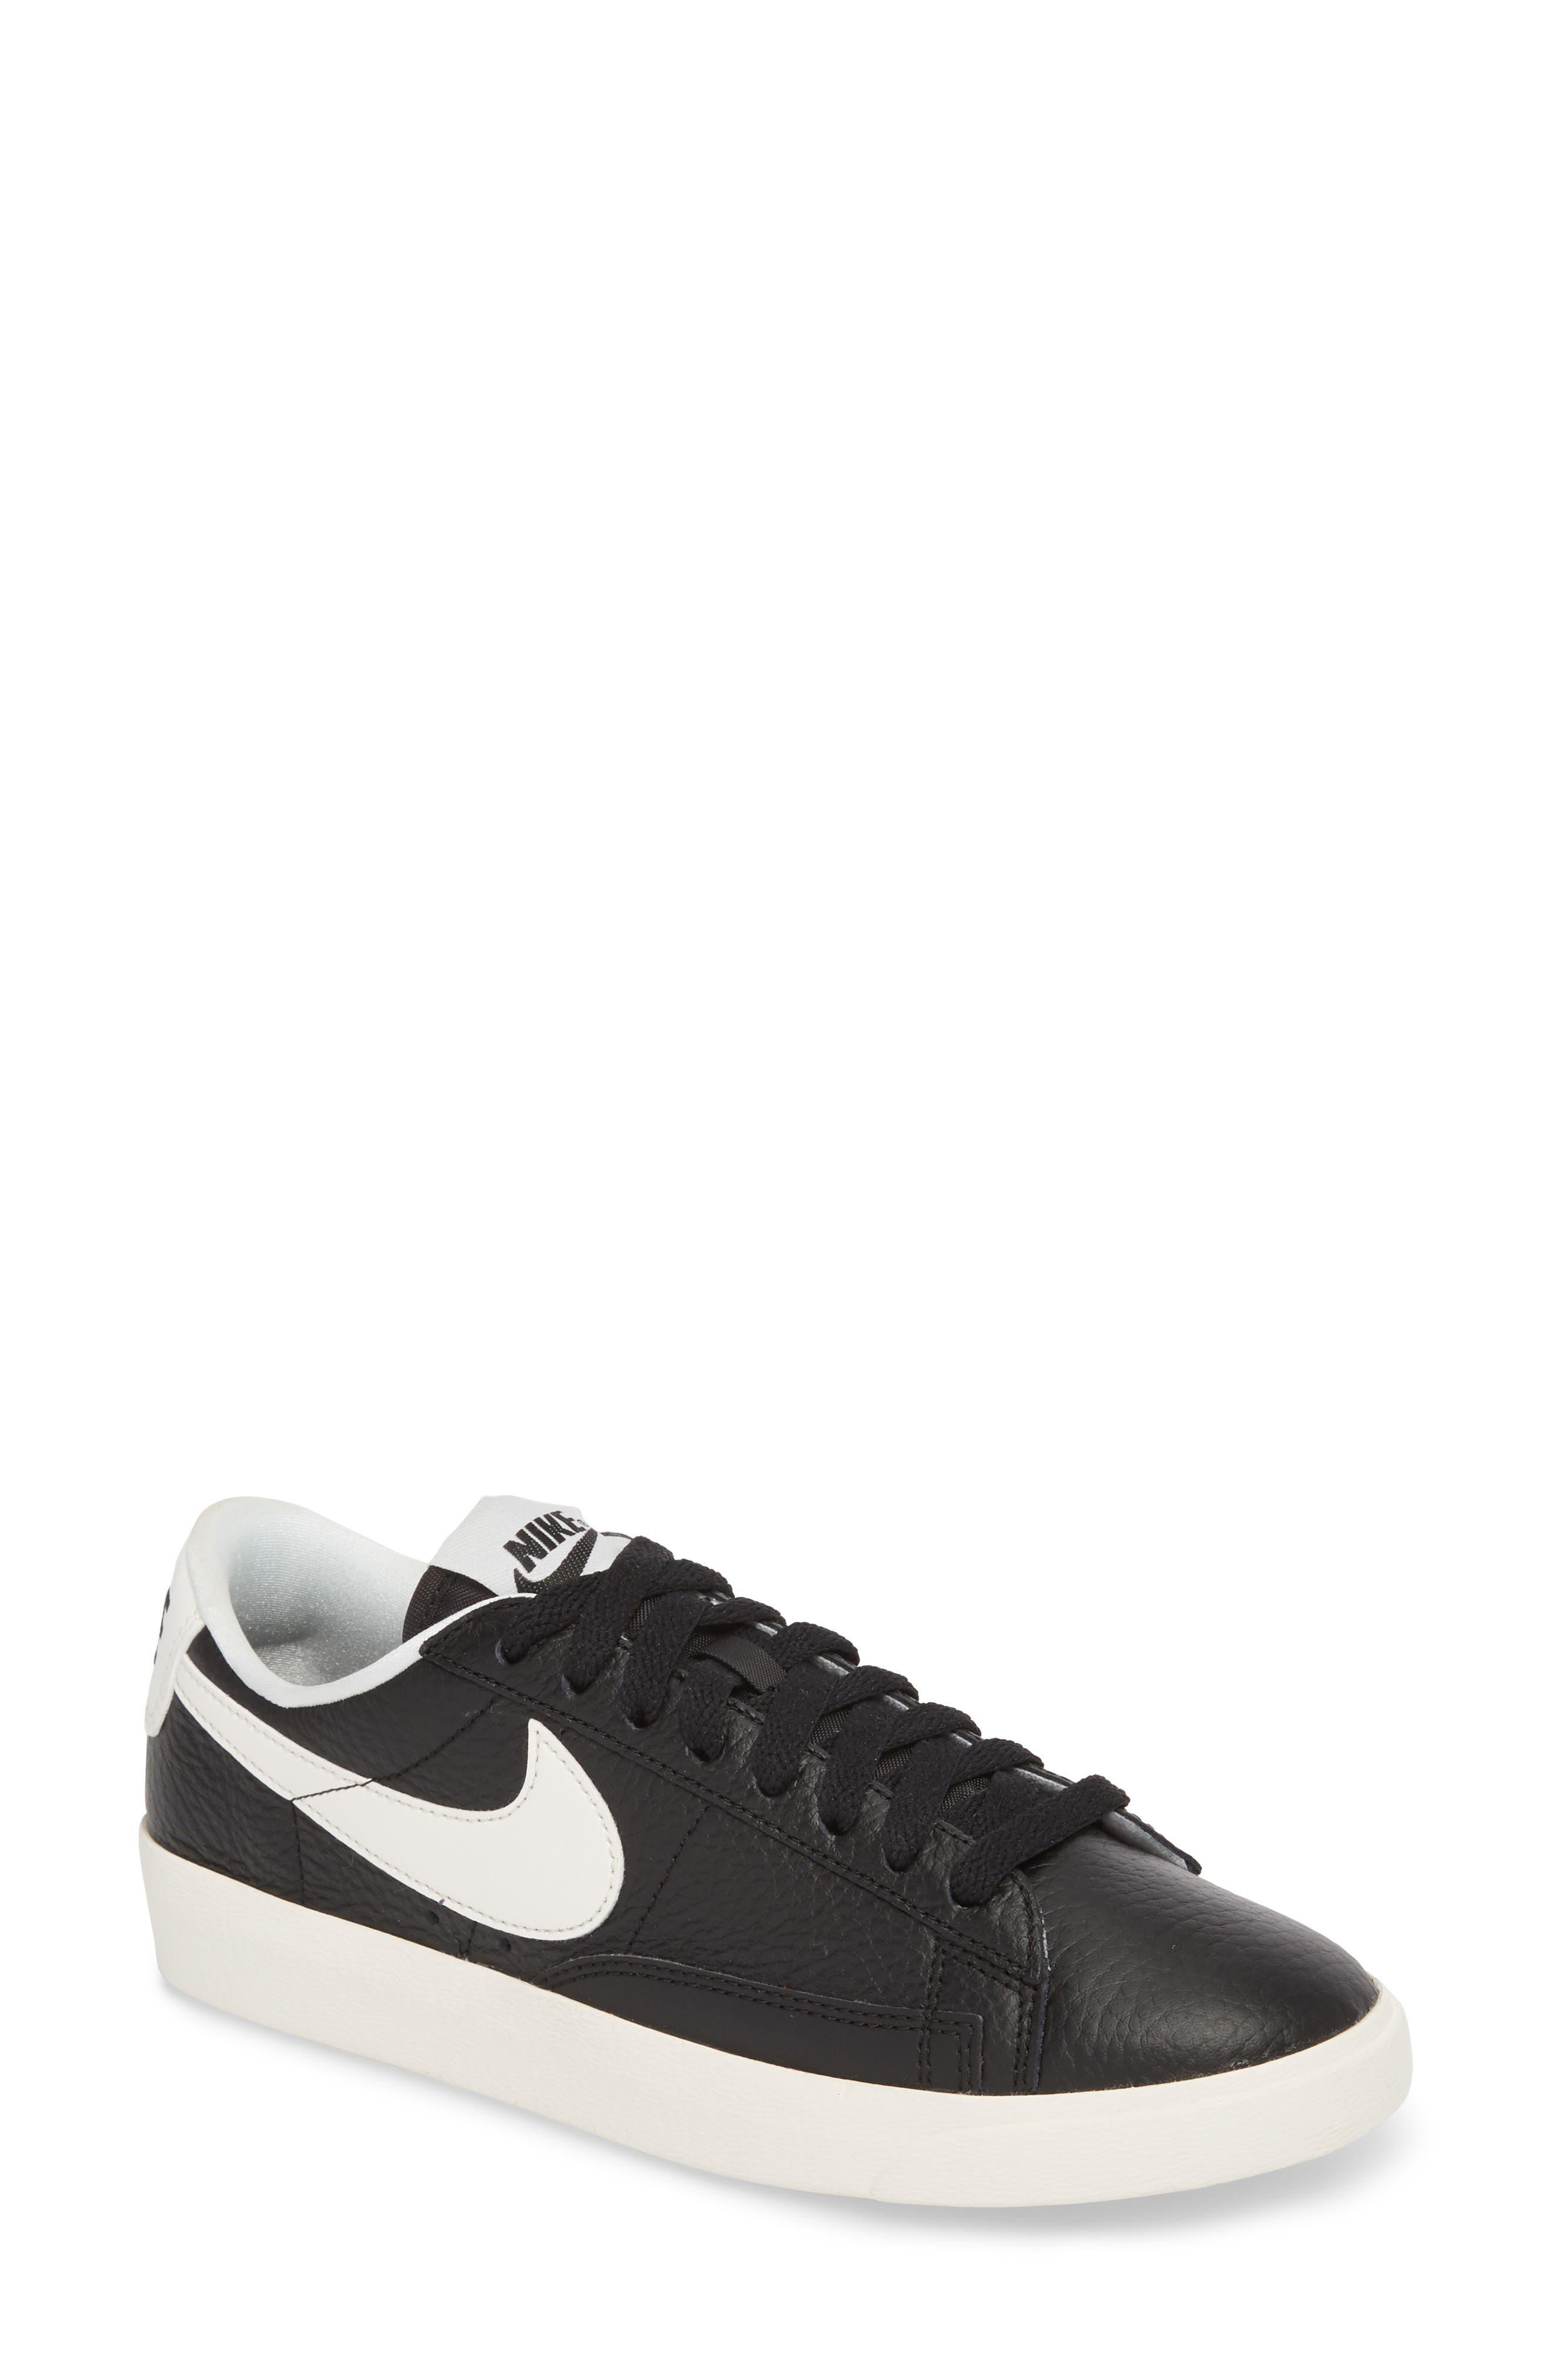 Blazer Premium Low Sneaker,                         Main,                         color, Black/ White/ Black